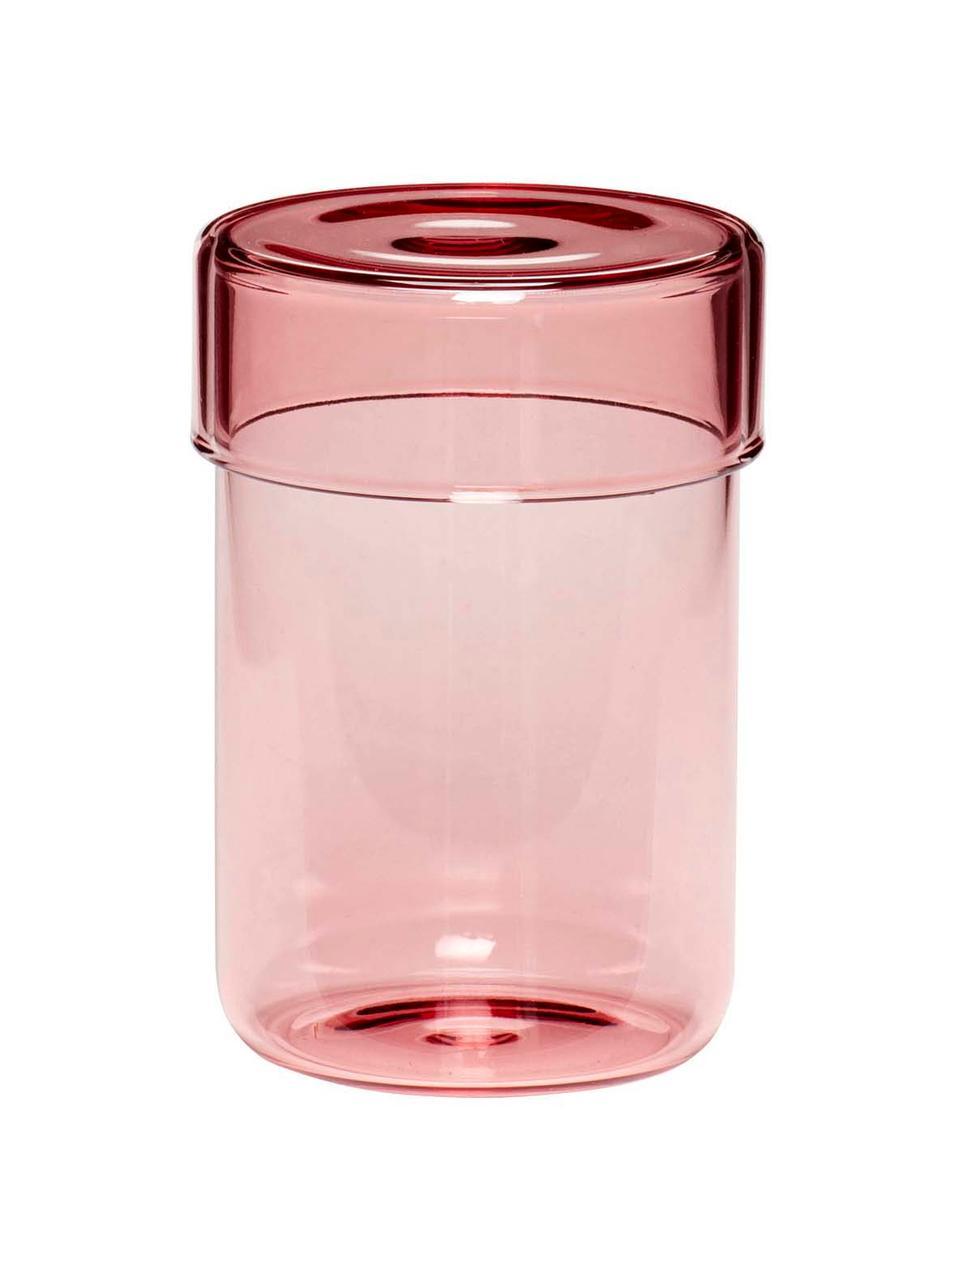 Opbergpottenset Transisto, 2-delig, Glas, Roze, Dozenset S